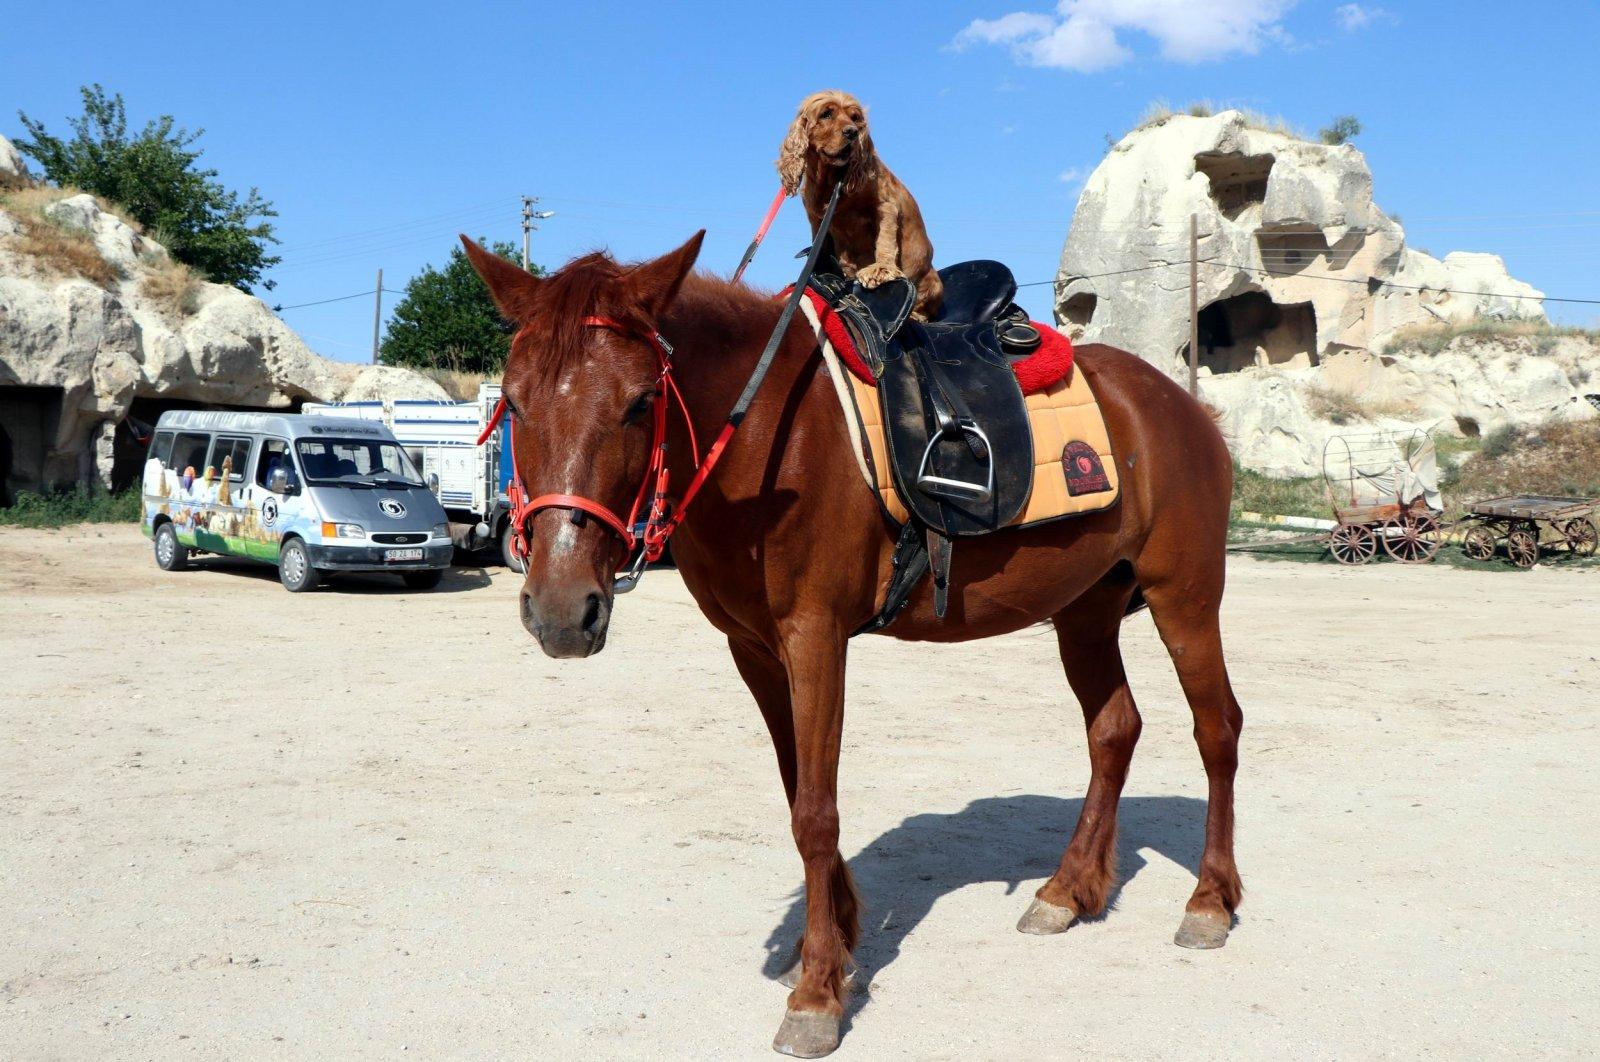 Boncuk rides a horse in Cappadocia, Nevşehir, Turkey, June 22, 2020. (IHA Photo)